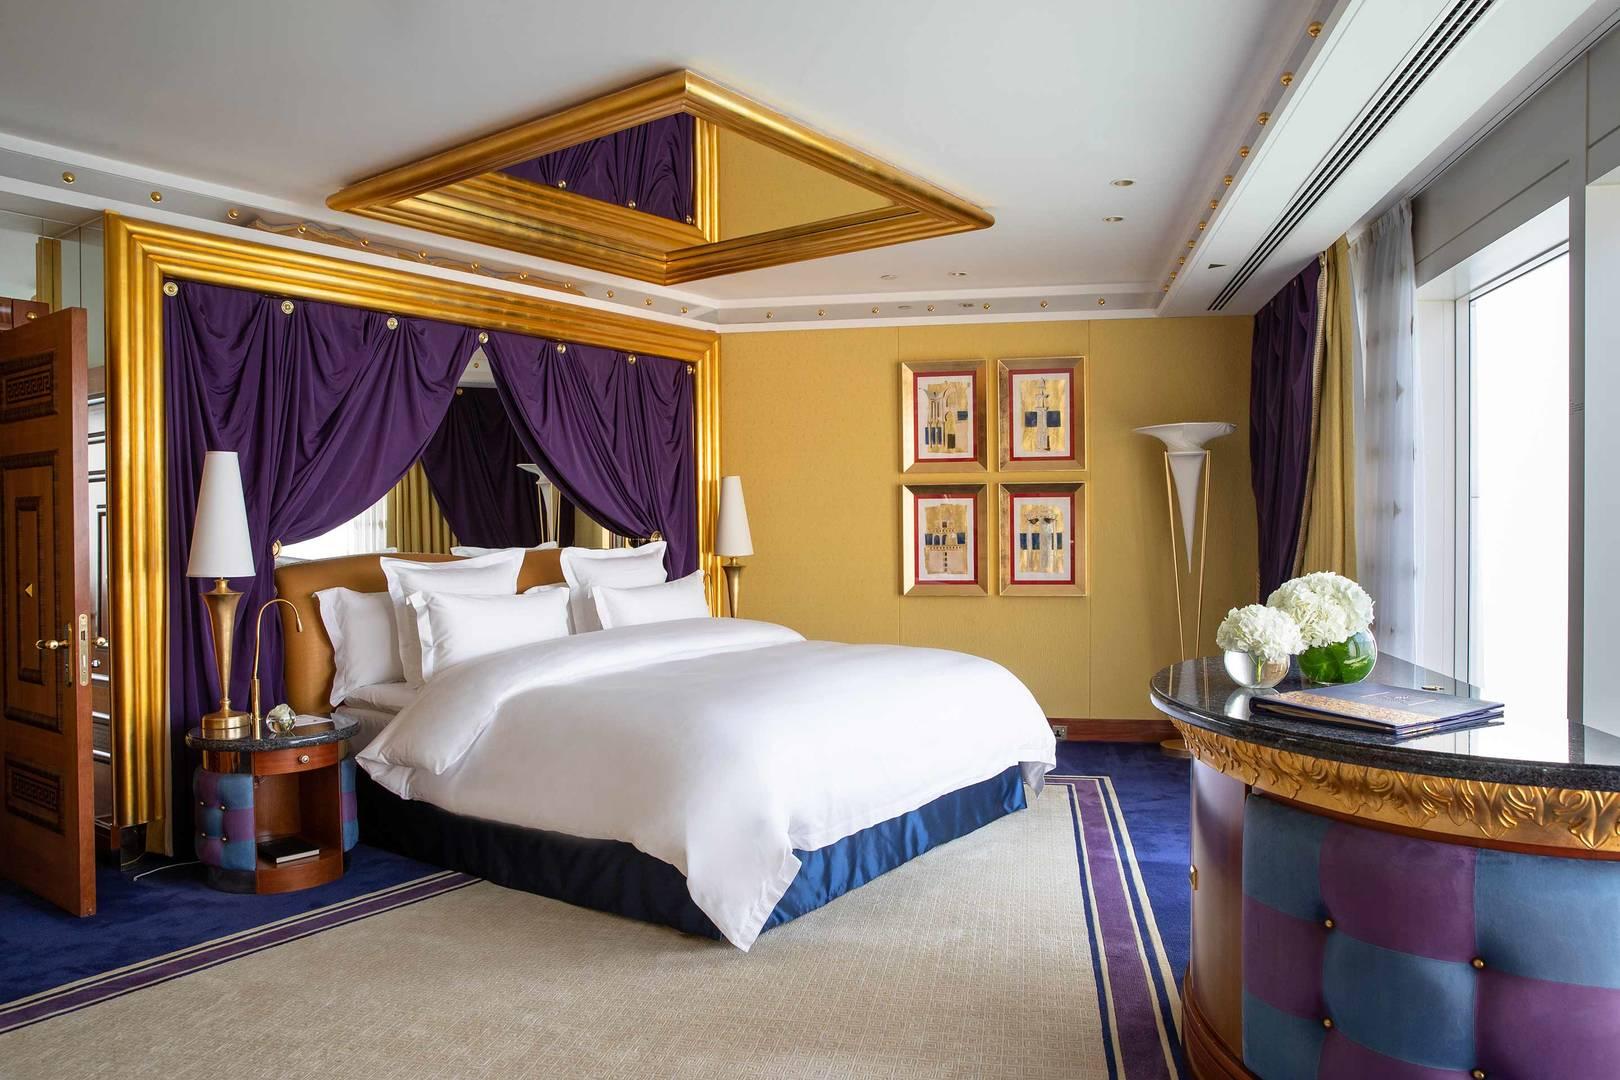 Deluxe One Bedroom Suite Burj Al Arab Jumeirah